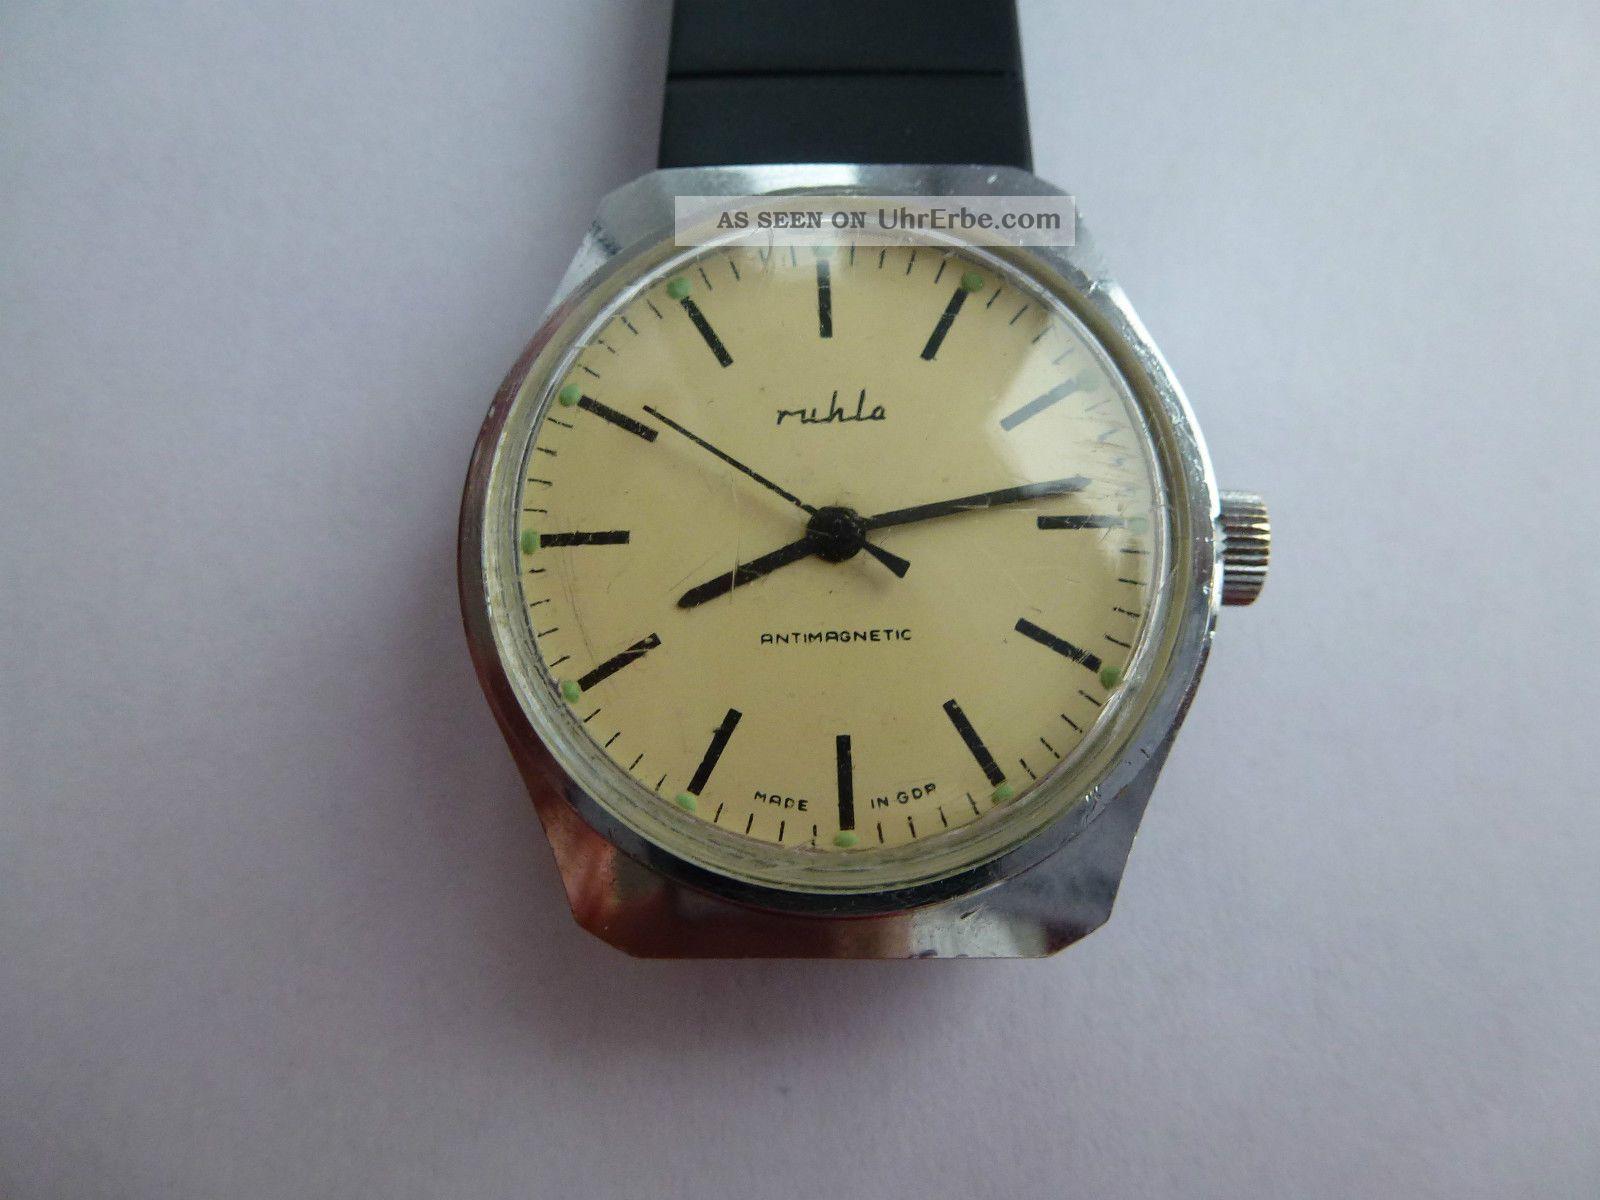 Hau Ruhla Kult Uhr Aus Der Ddr,  70er. Armbanduhren Bild